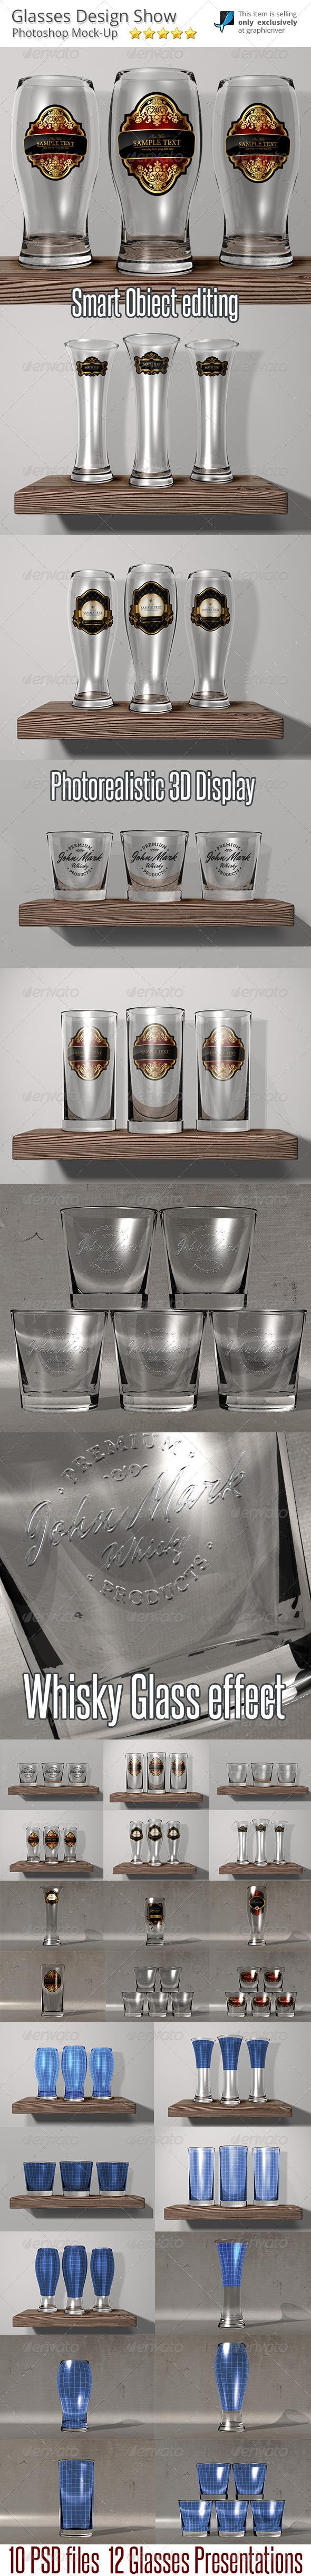 Glasses Mock-Up Presentation - Food and Drink Packaging